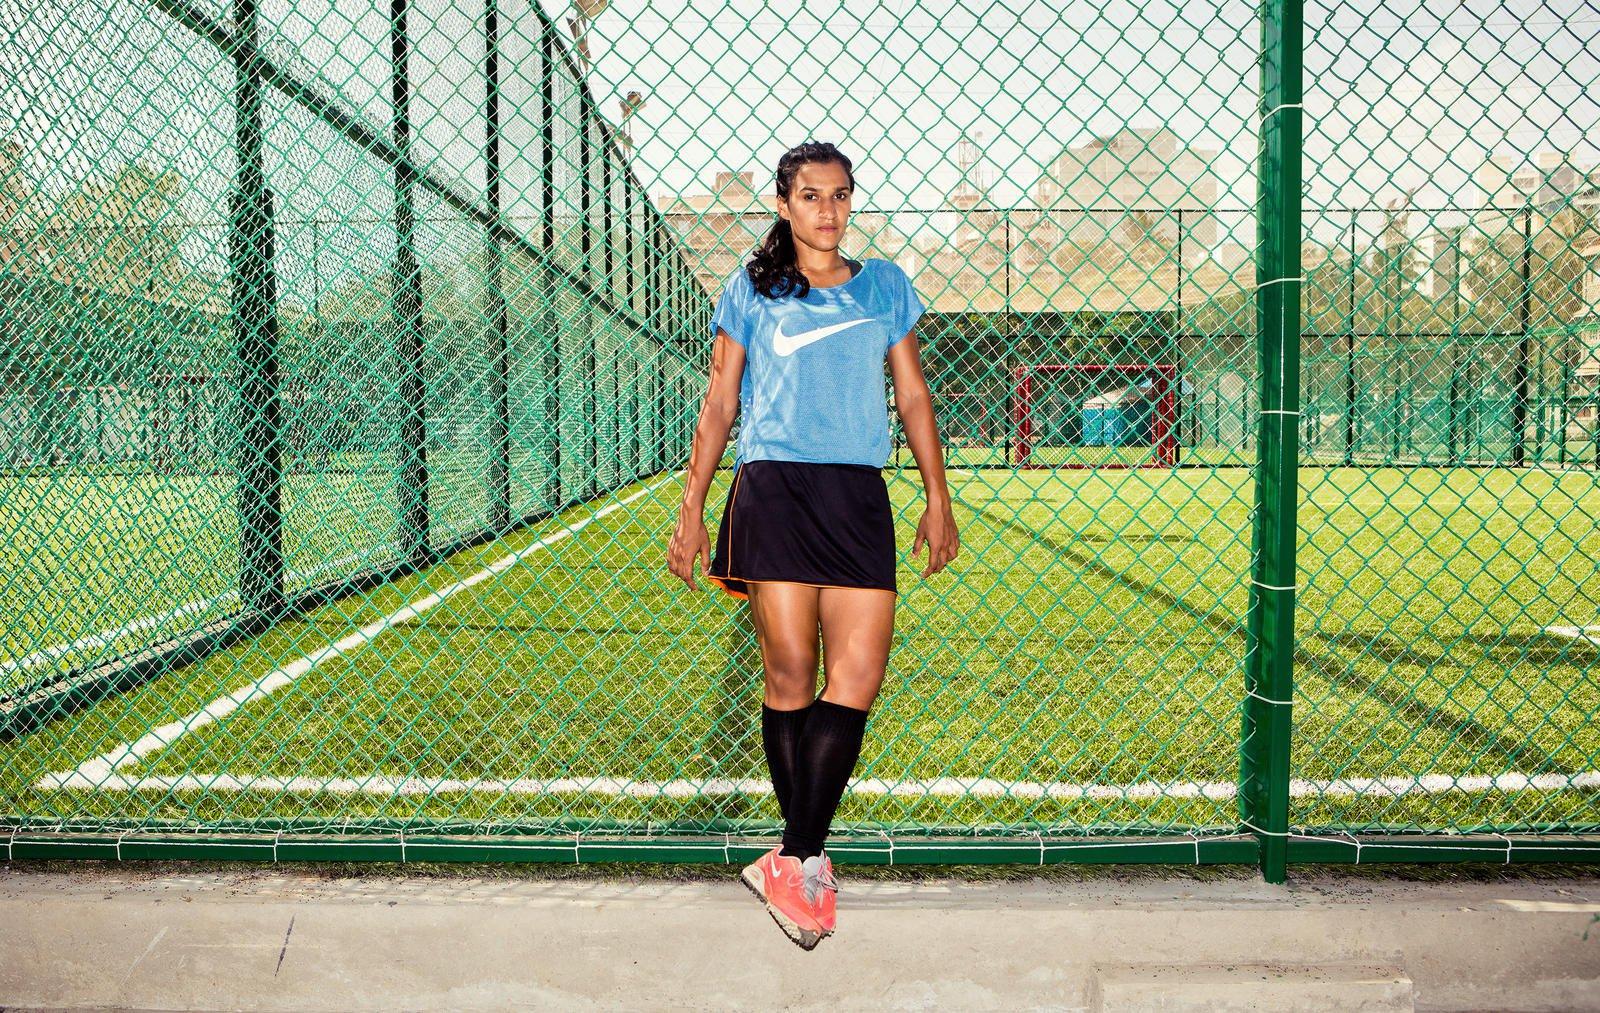 India-female-athletes-Nike-video-BODY-Rani_Rampal.jpg